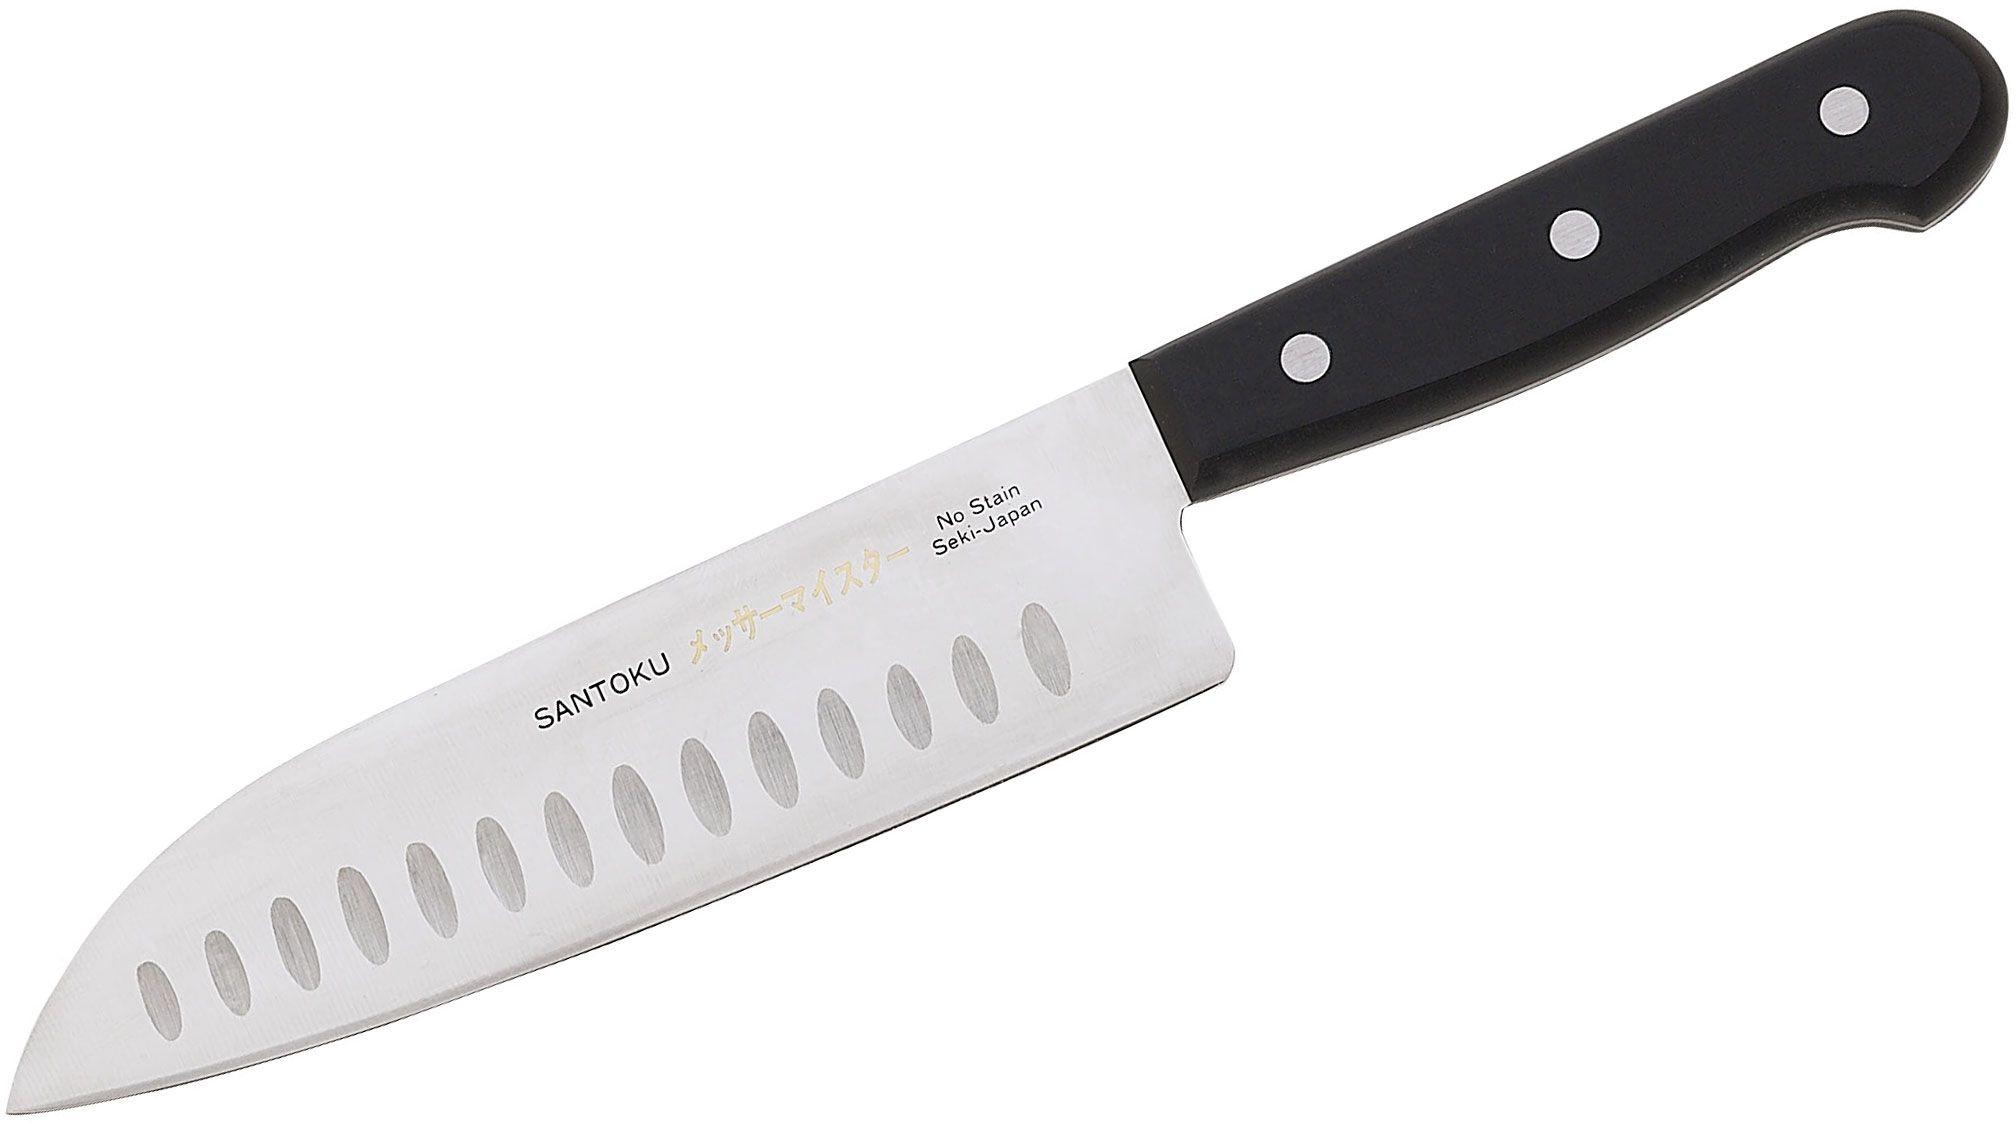 Messermeister Asian Precision 7-1/4 inch Kullenschliff Santoku Knife